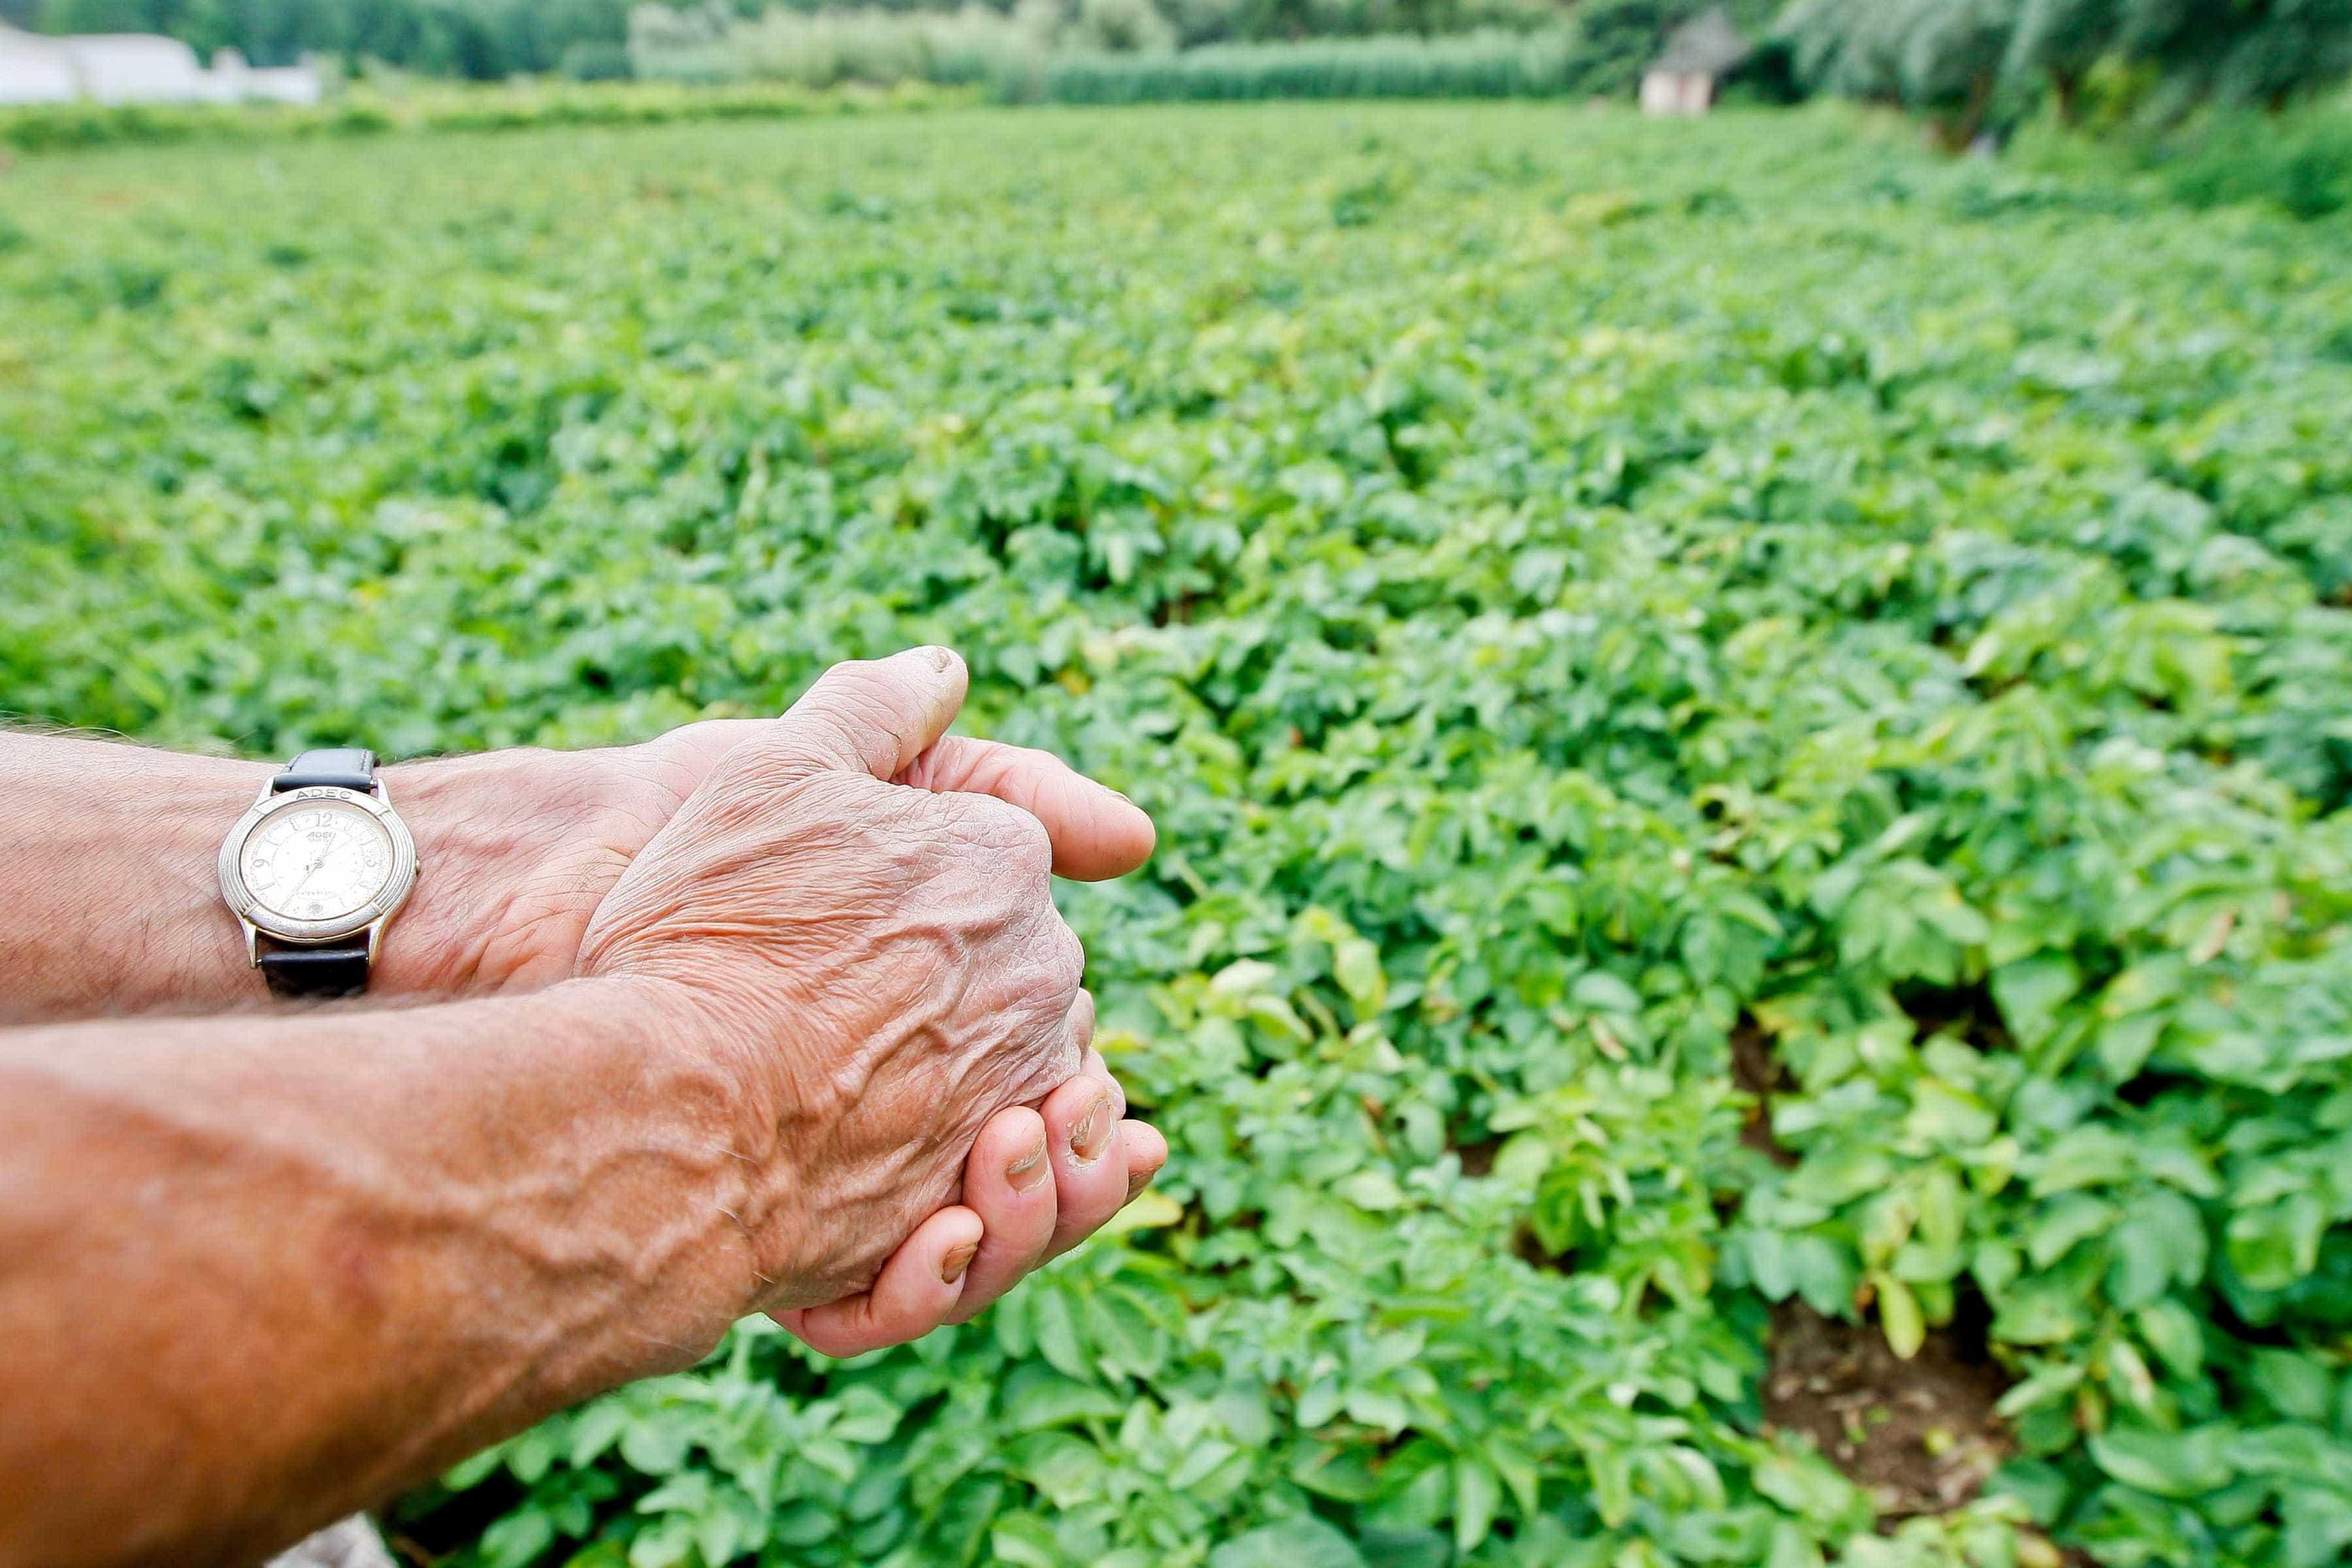 Ministério da Agricultura paga 97 milhões aos agricultores